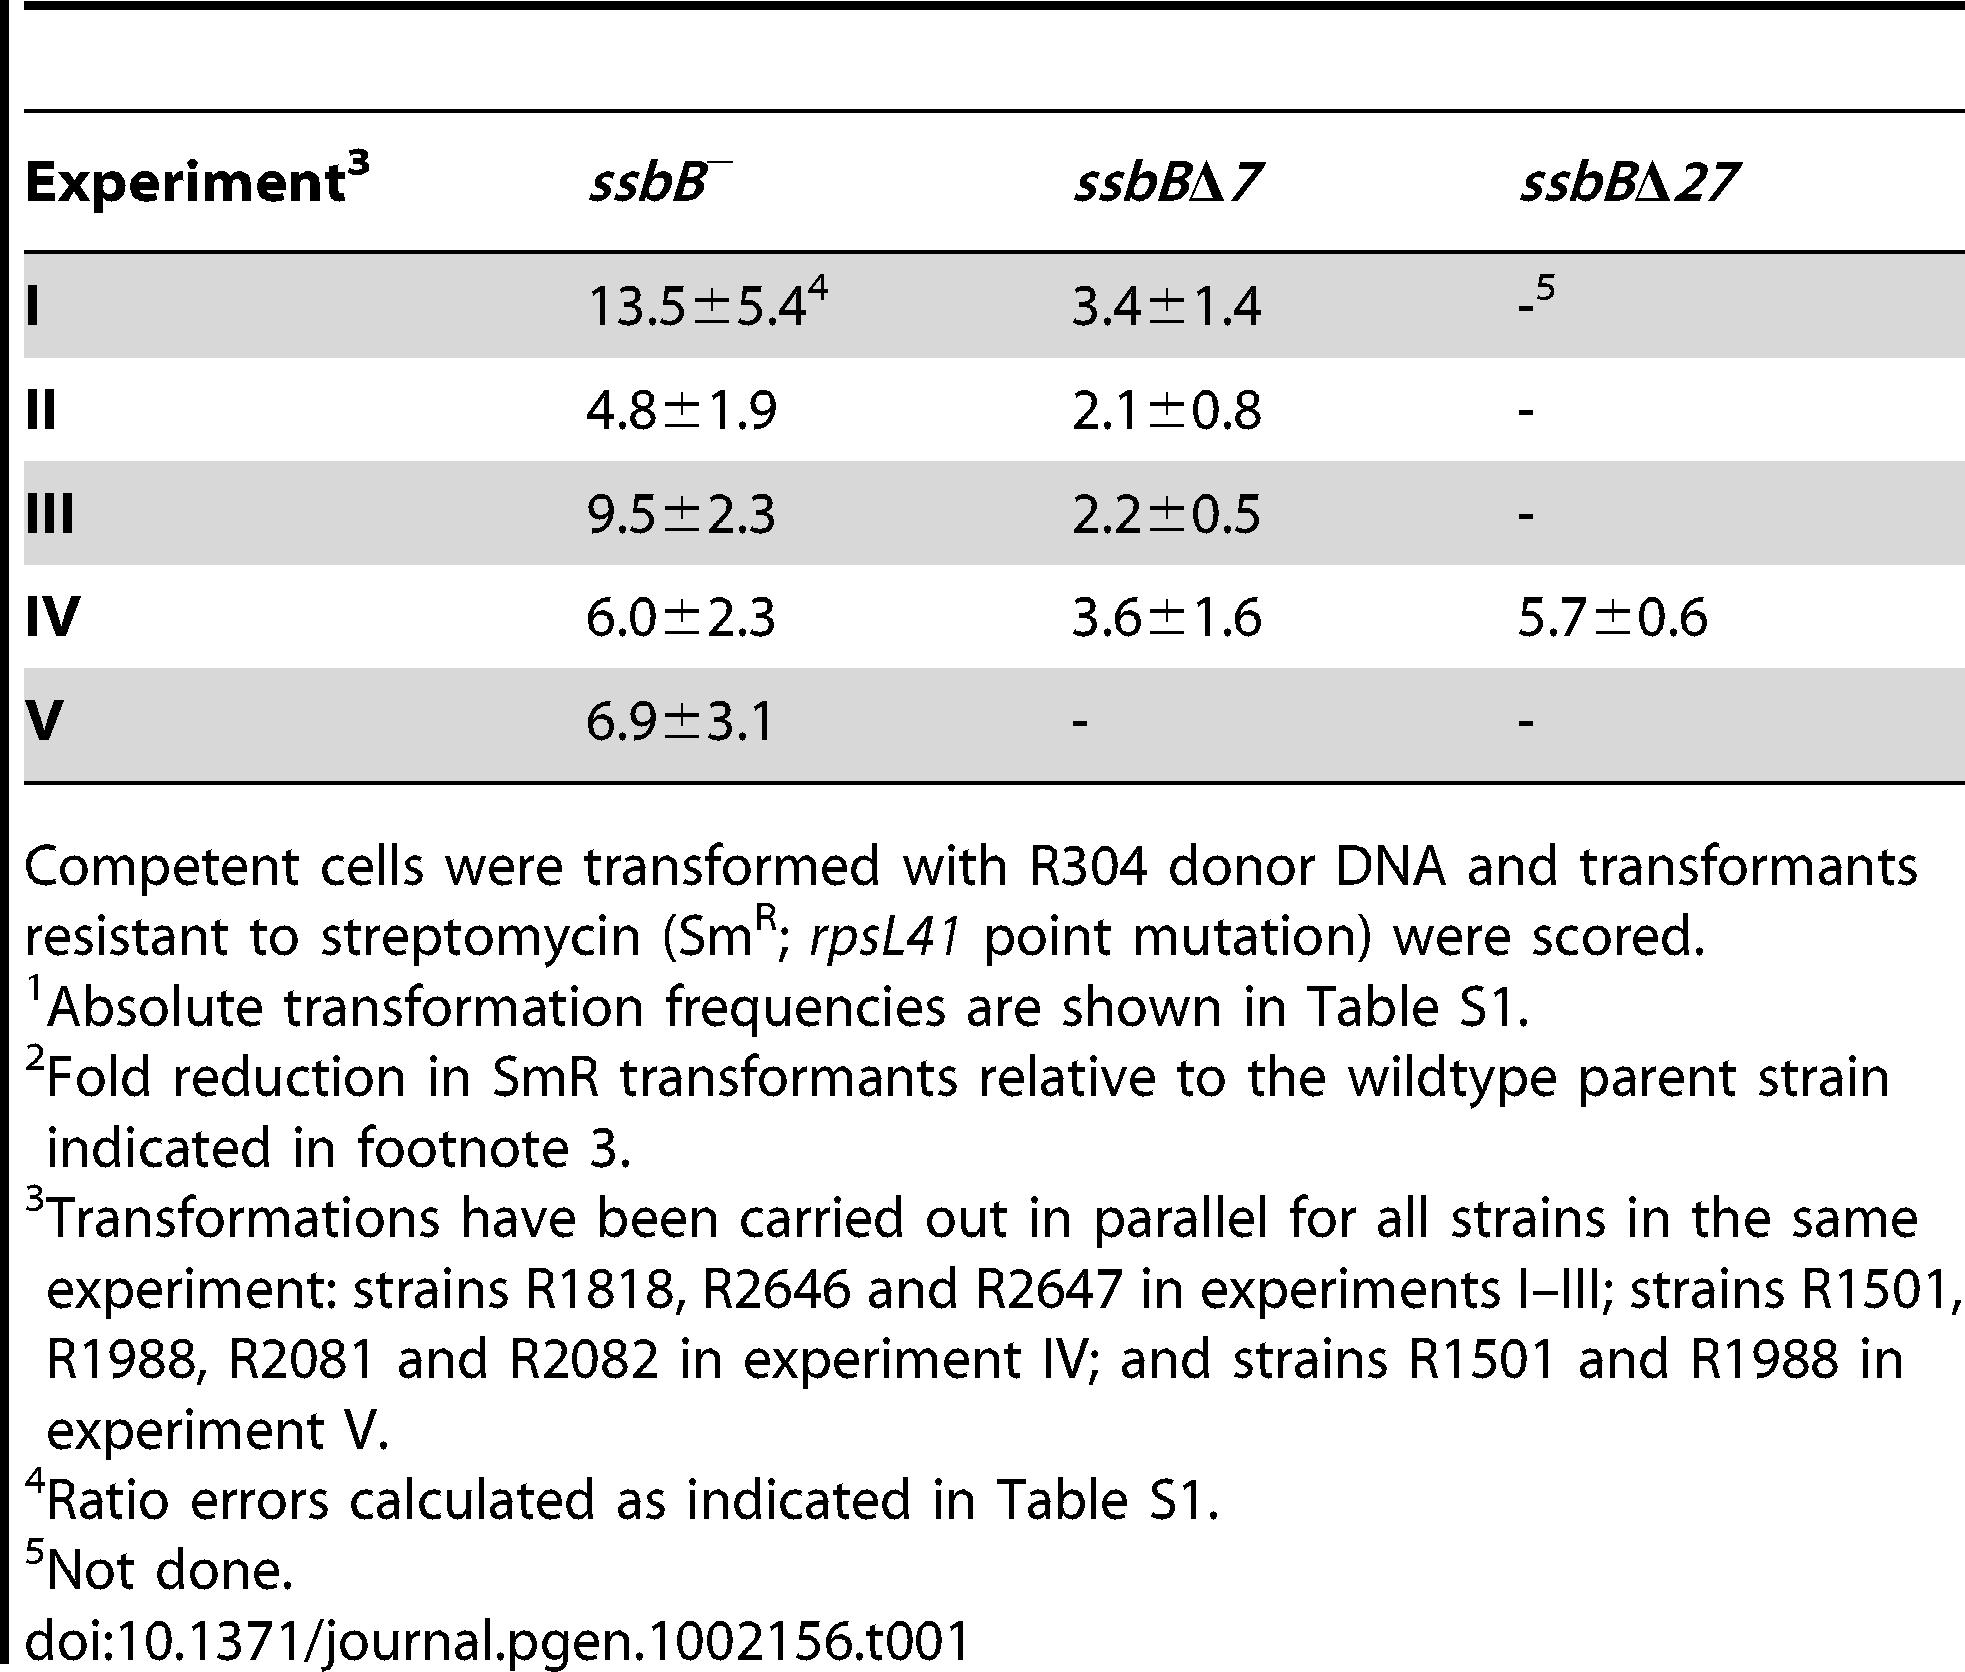 Fold reduction in chromosomal transformation frequency<em class=&quot;ref&quot;>1</em> in <i>ssbB</i><sup>−</sup>, <i>ssbB</i>Δ<i>7</i>, and <i>ssbB</i>Δ<i>27</i> cells<em class=&quot;ref&quot;>2</em>.